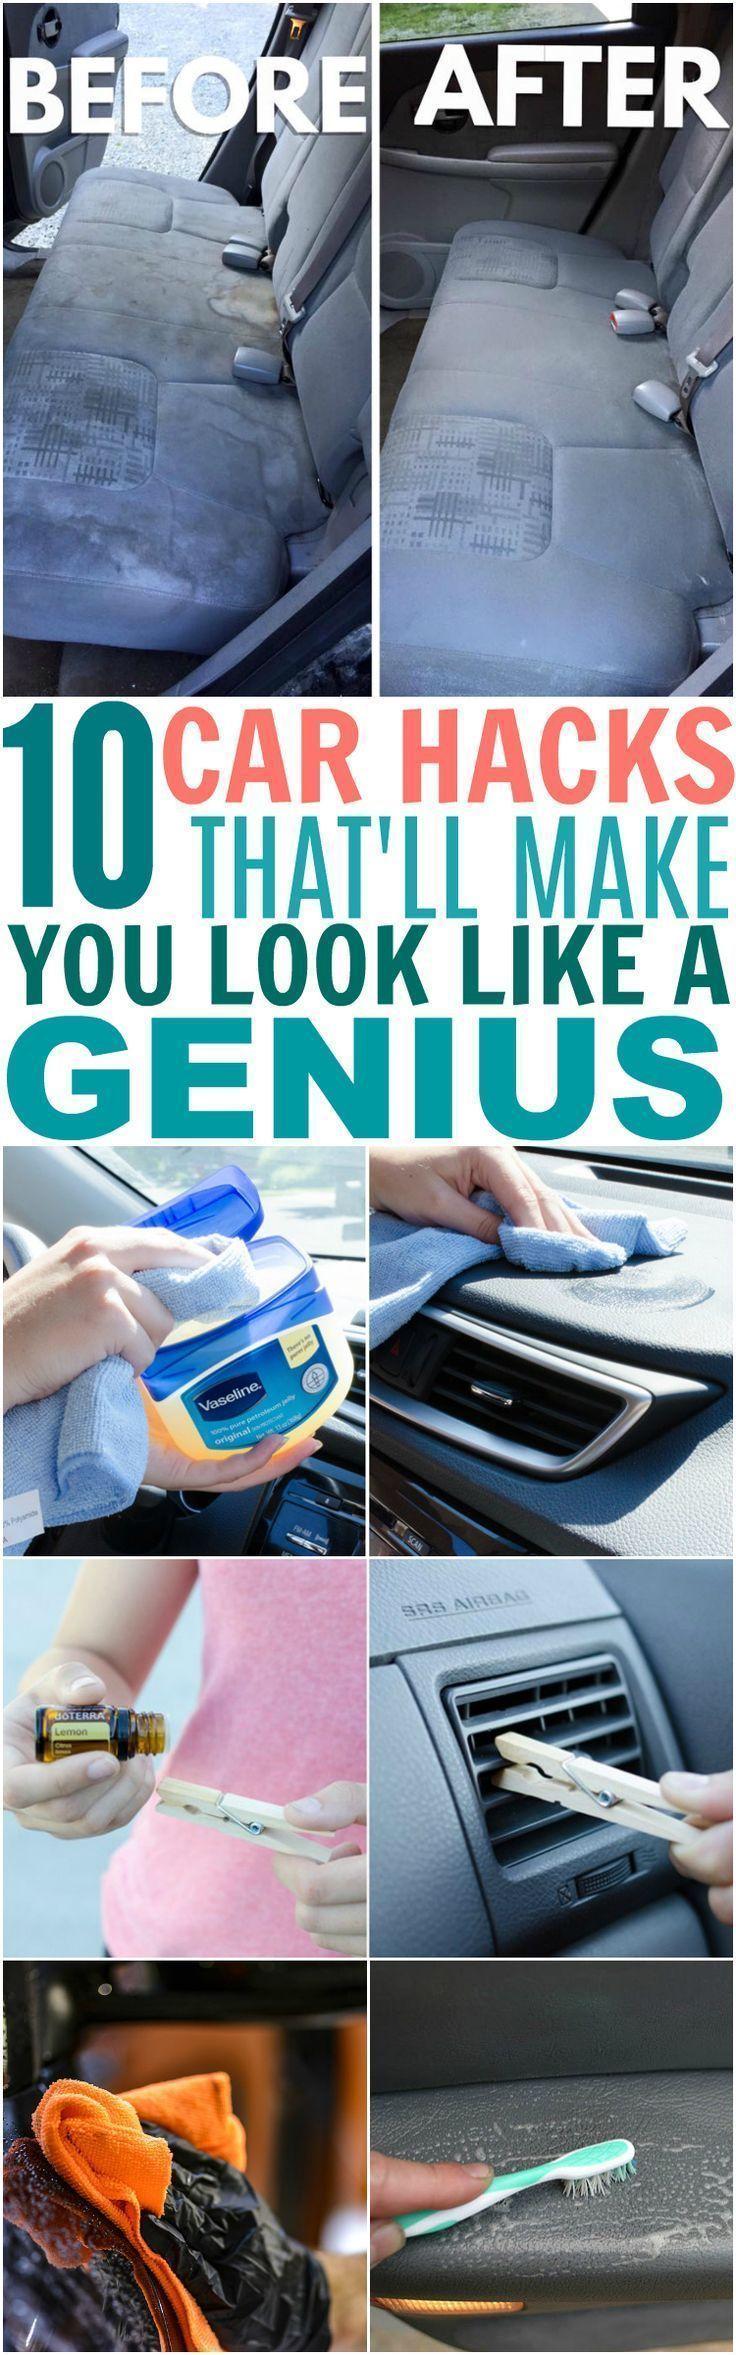 393 best My Wheels images on Pinterest | Car hacks, Car life hacks ...